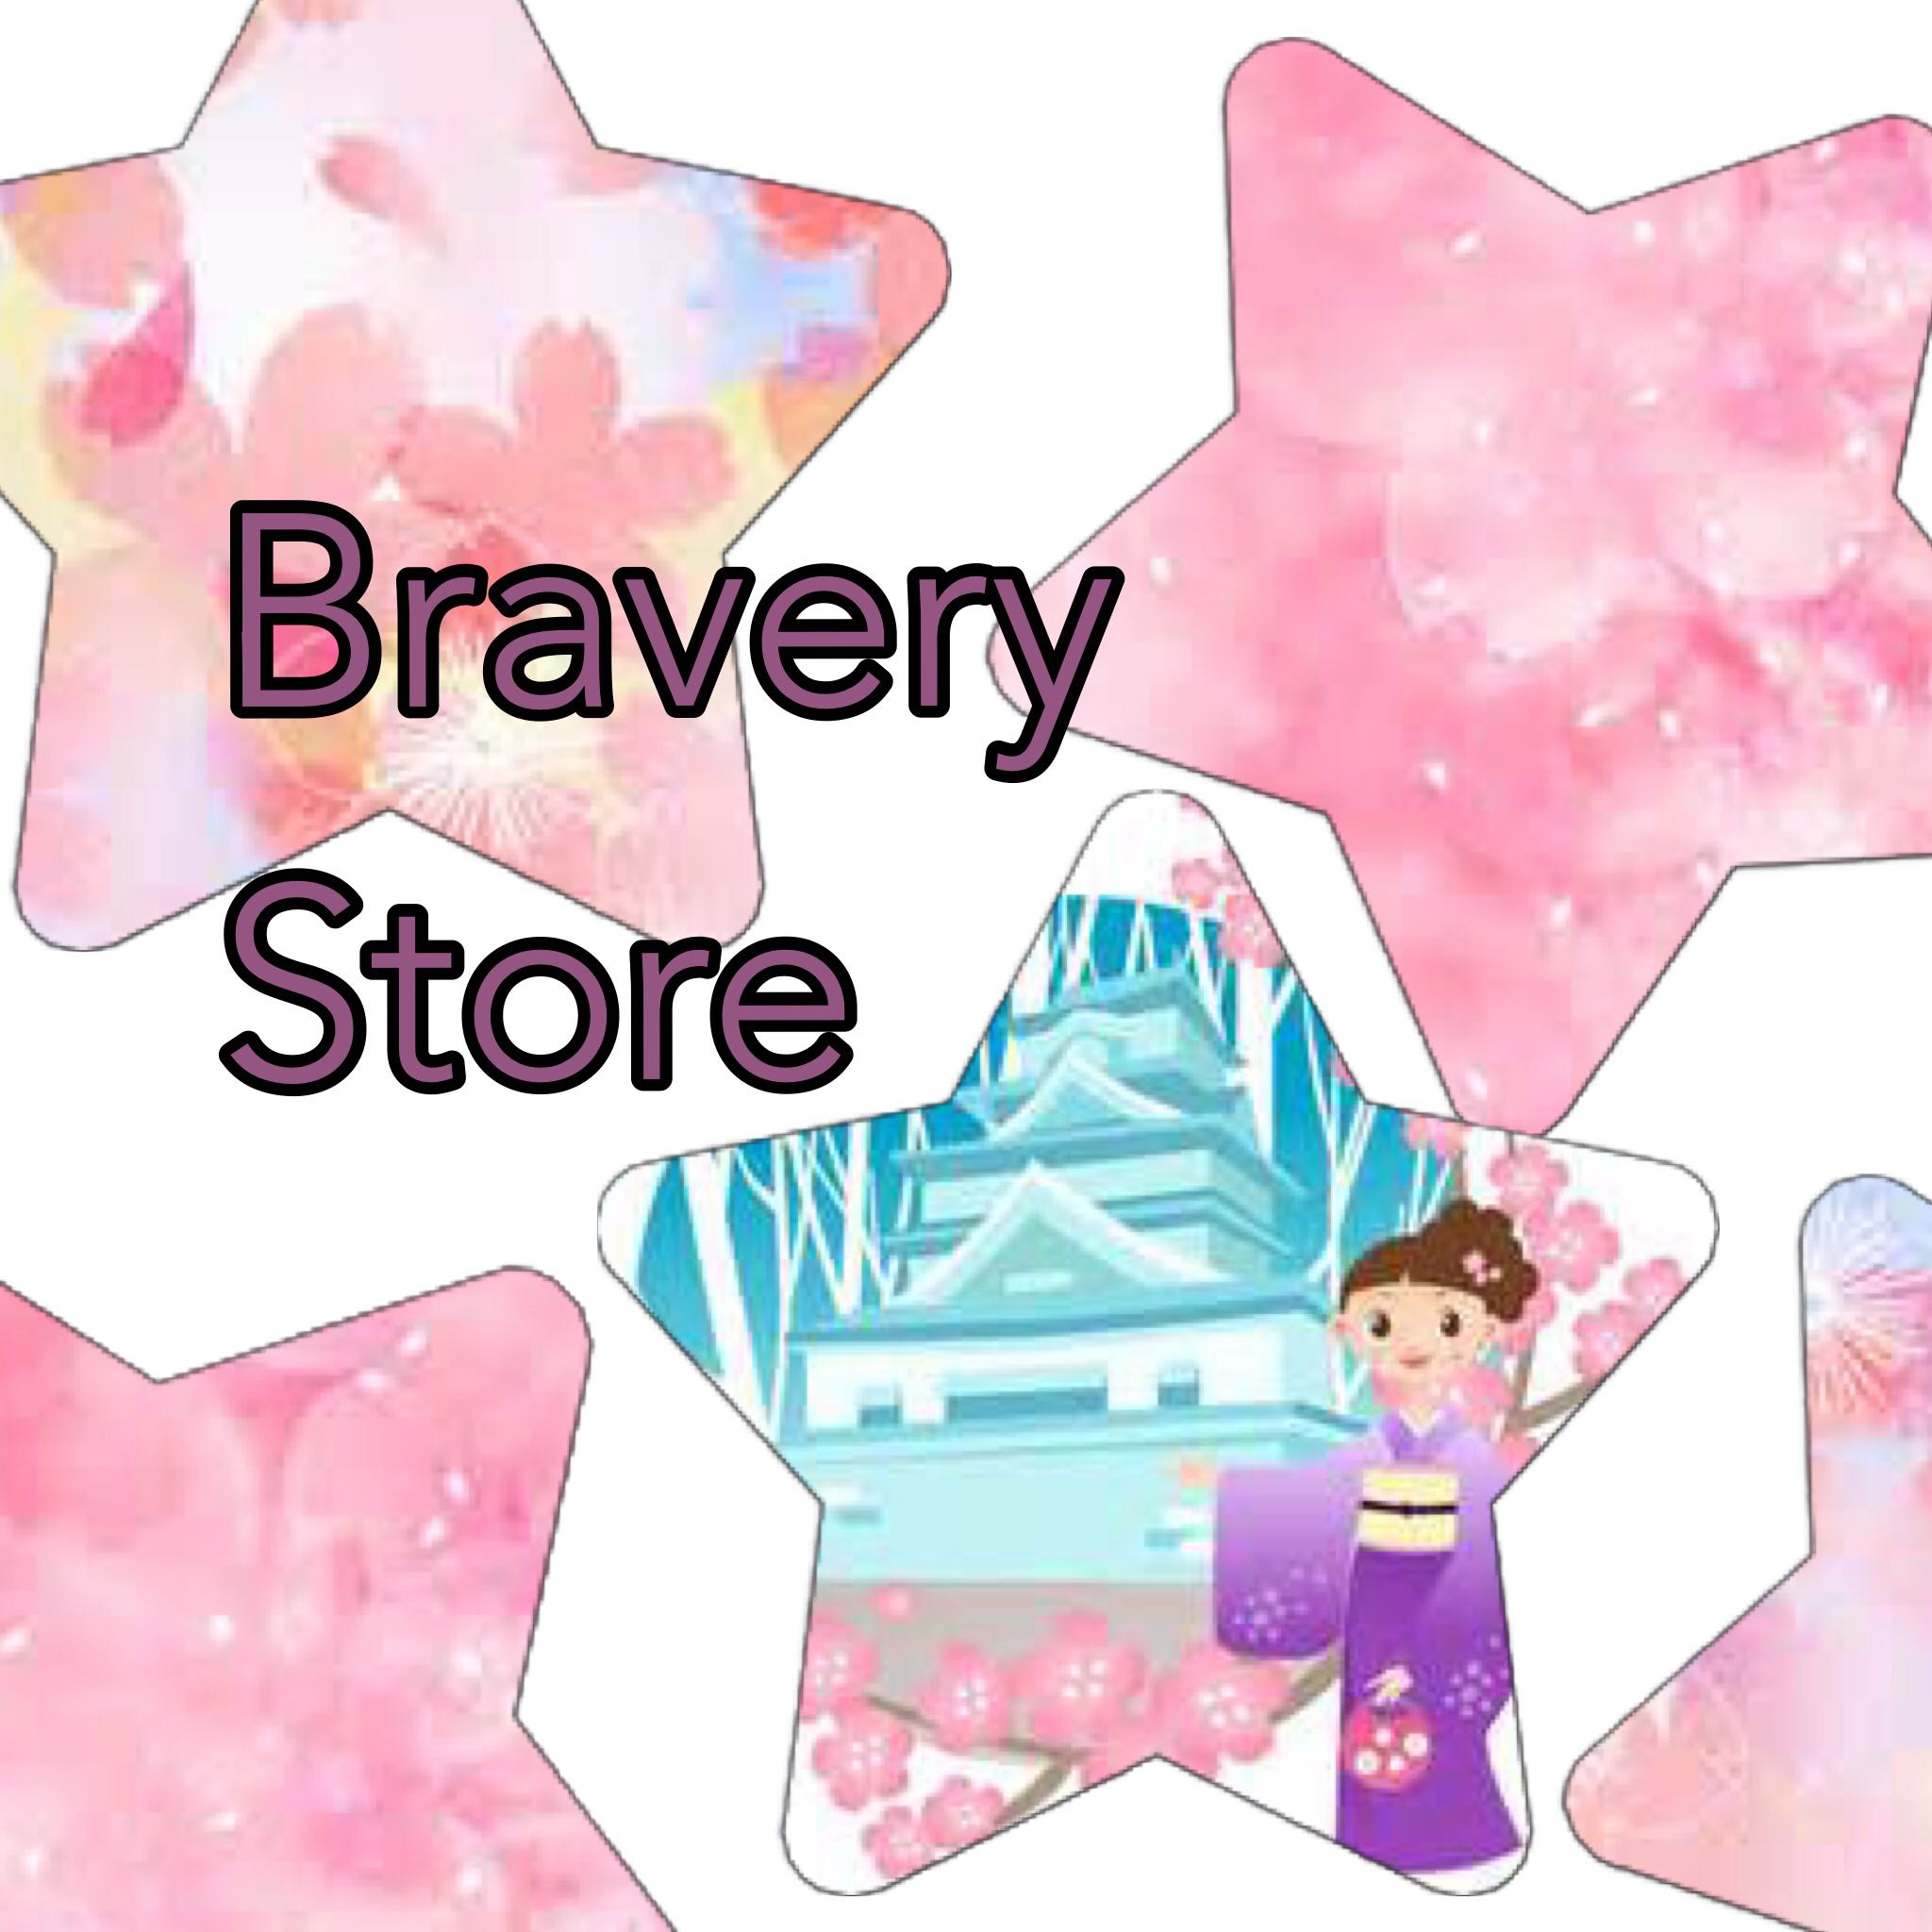 bravery_store